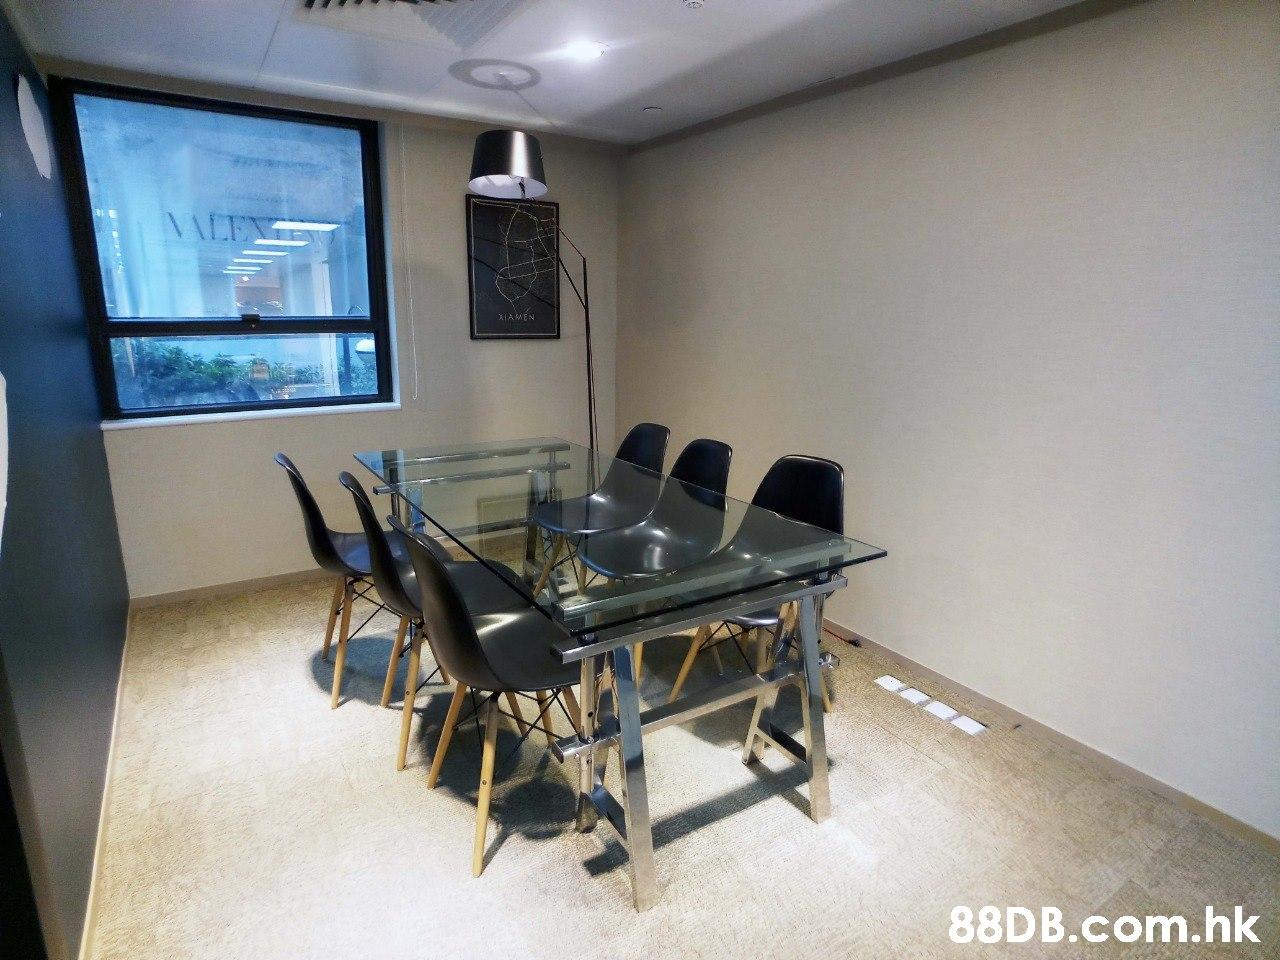 NALEX .hk  Property,Room,Building,Interior design,Real estate